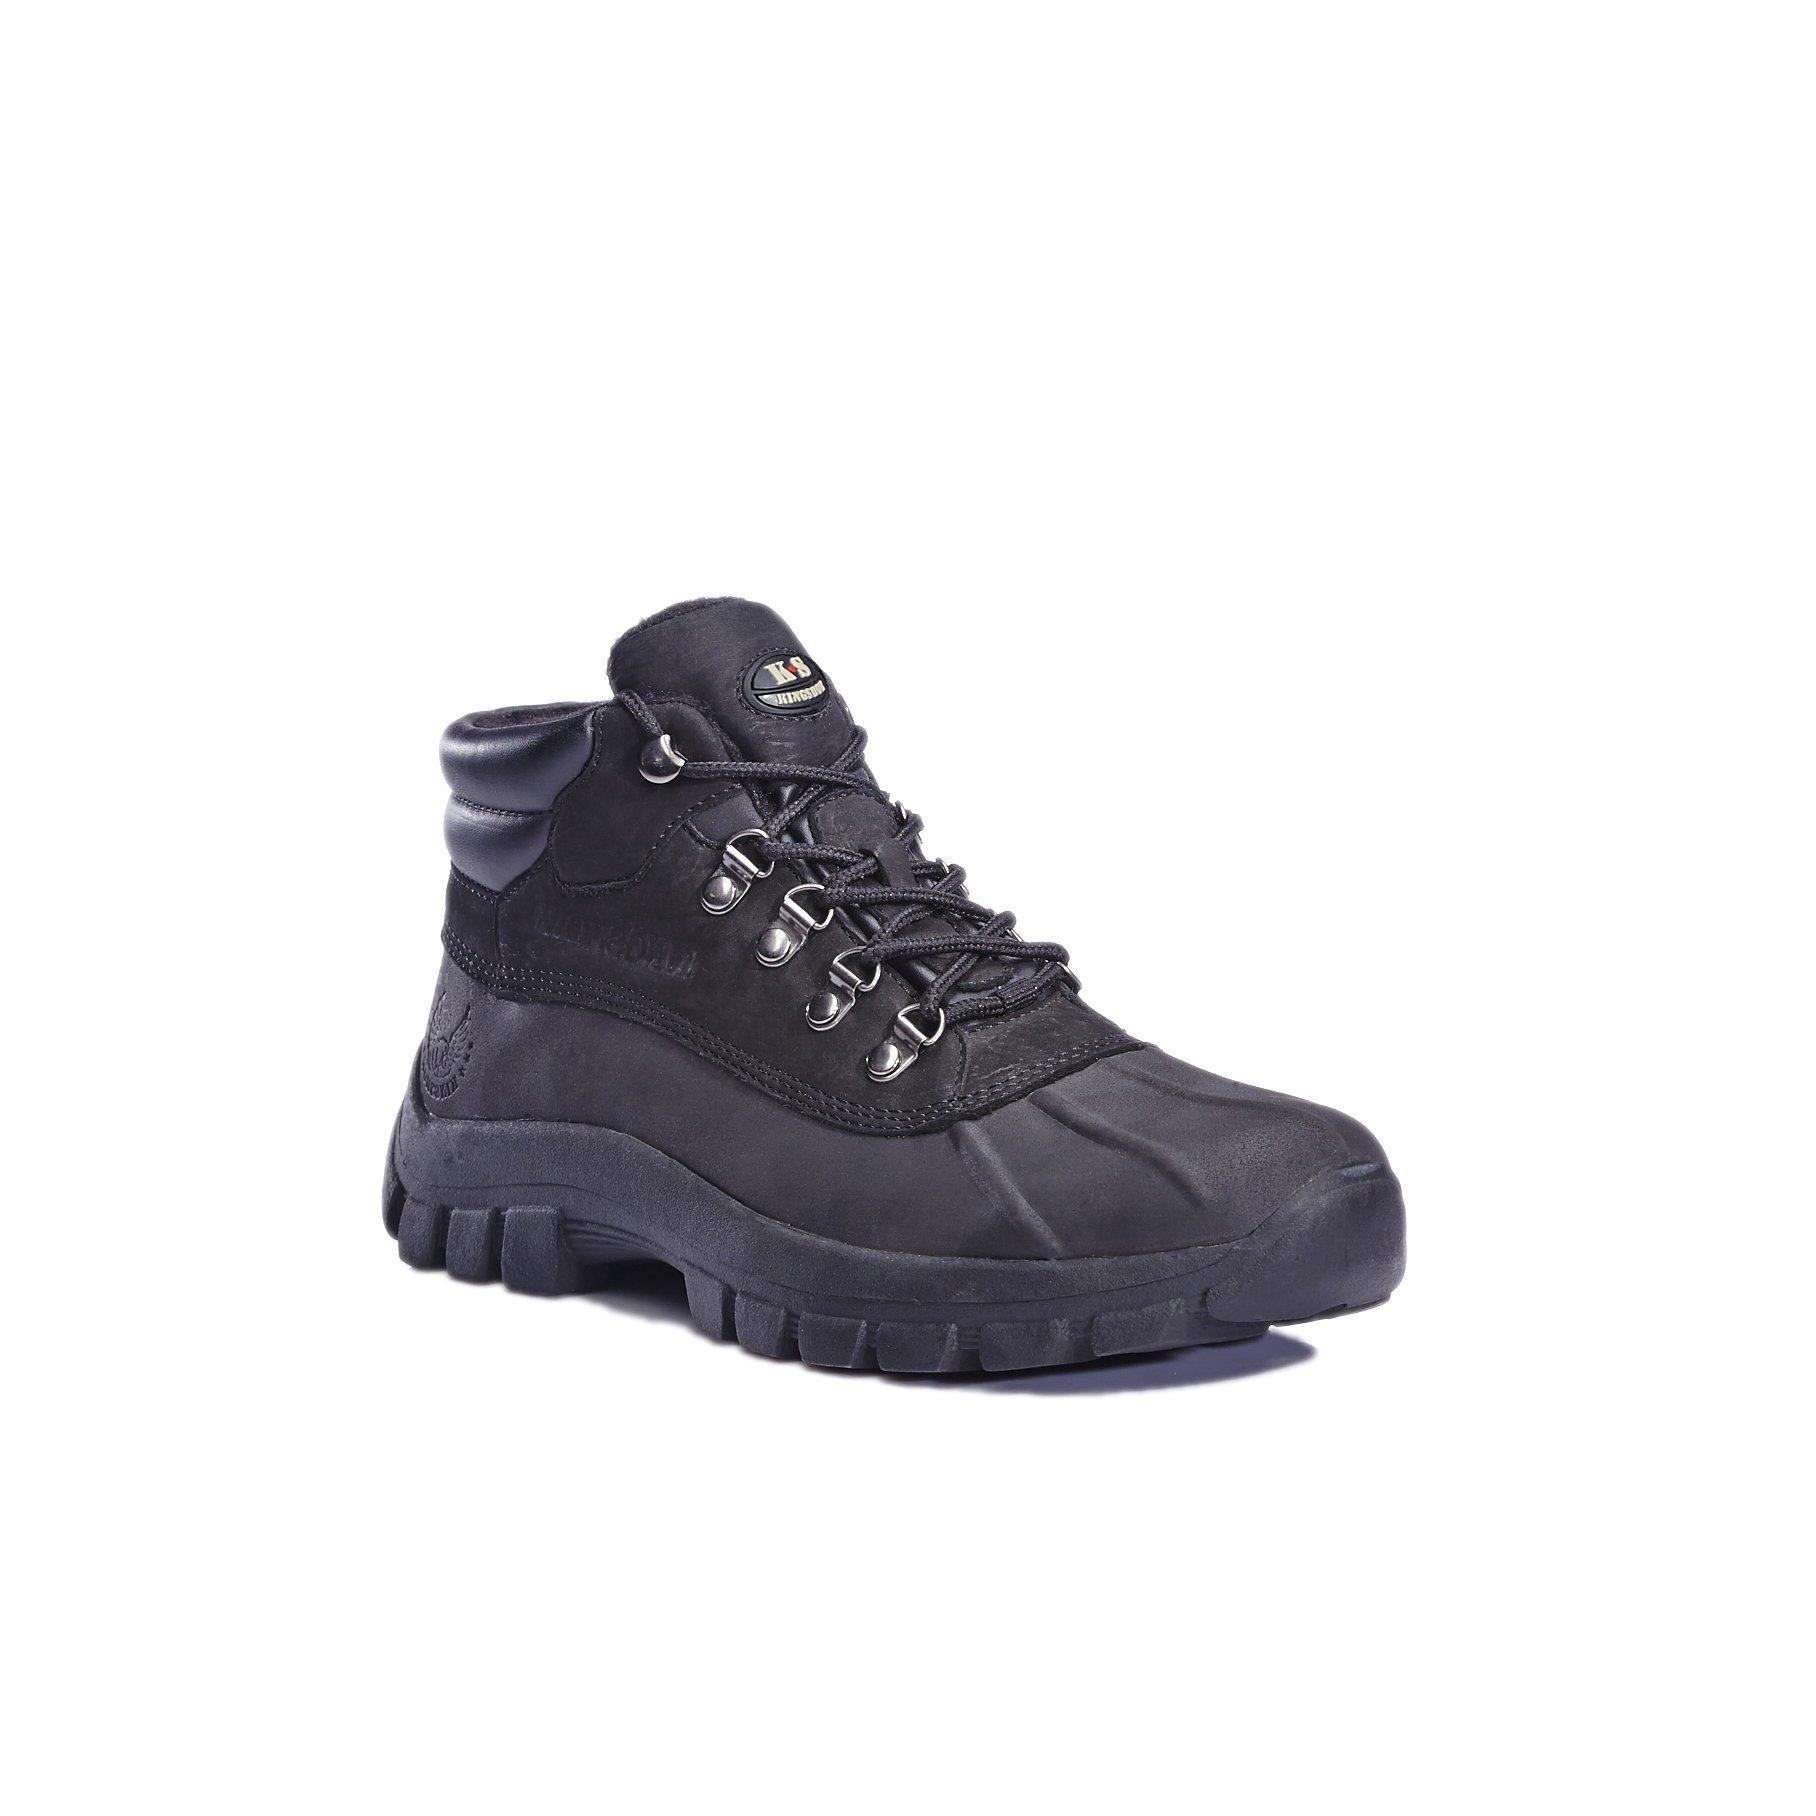 Amazon.com: Bringsine Massaging Insoles - Best Shoe